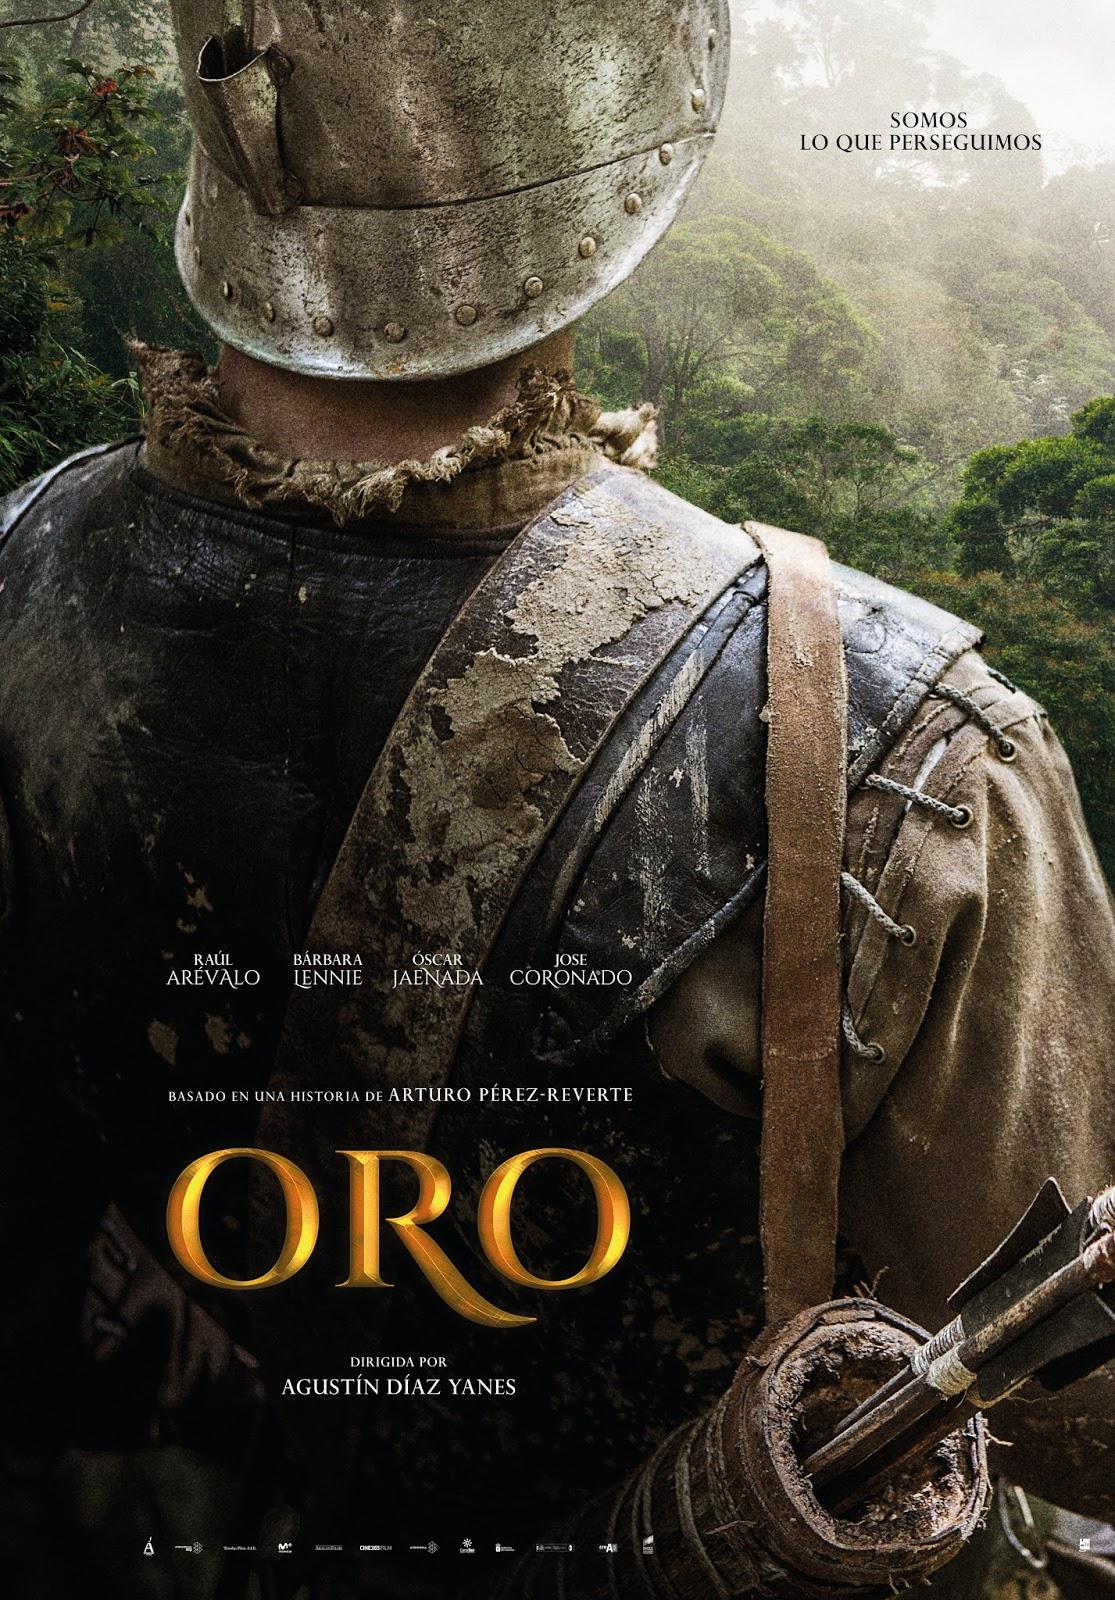 Se muestra el teaser póster del largometraje Oro